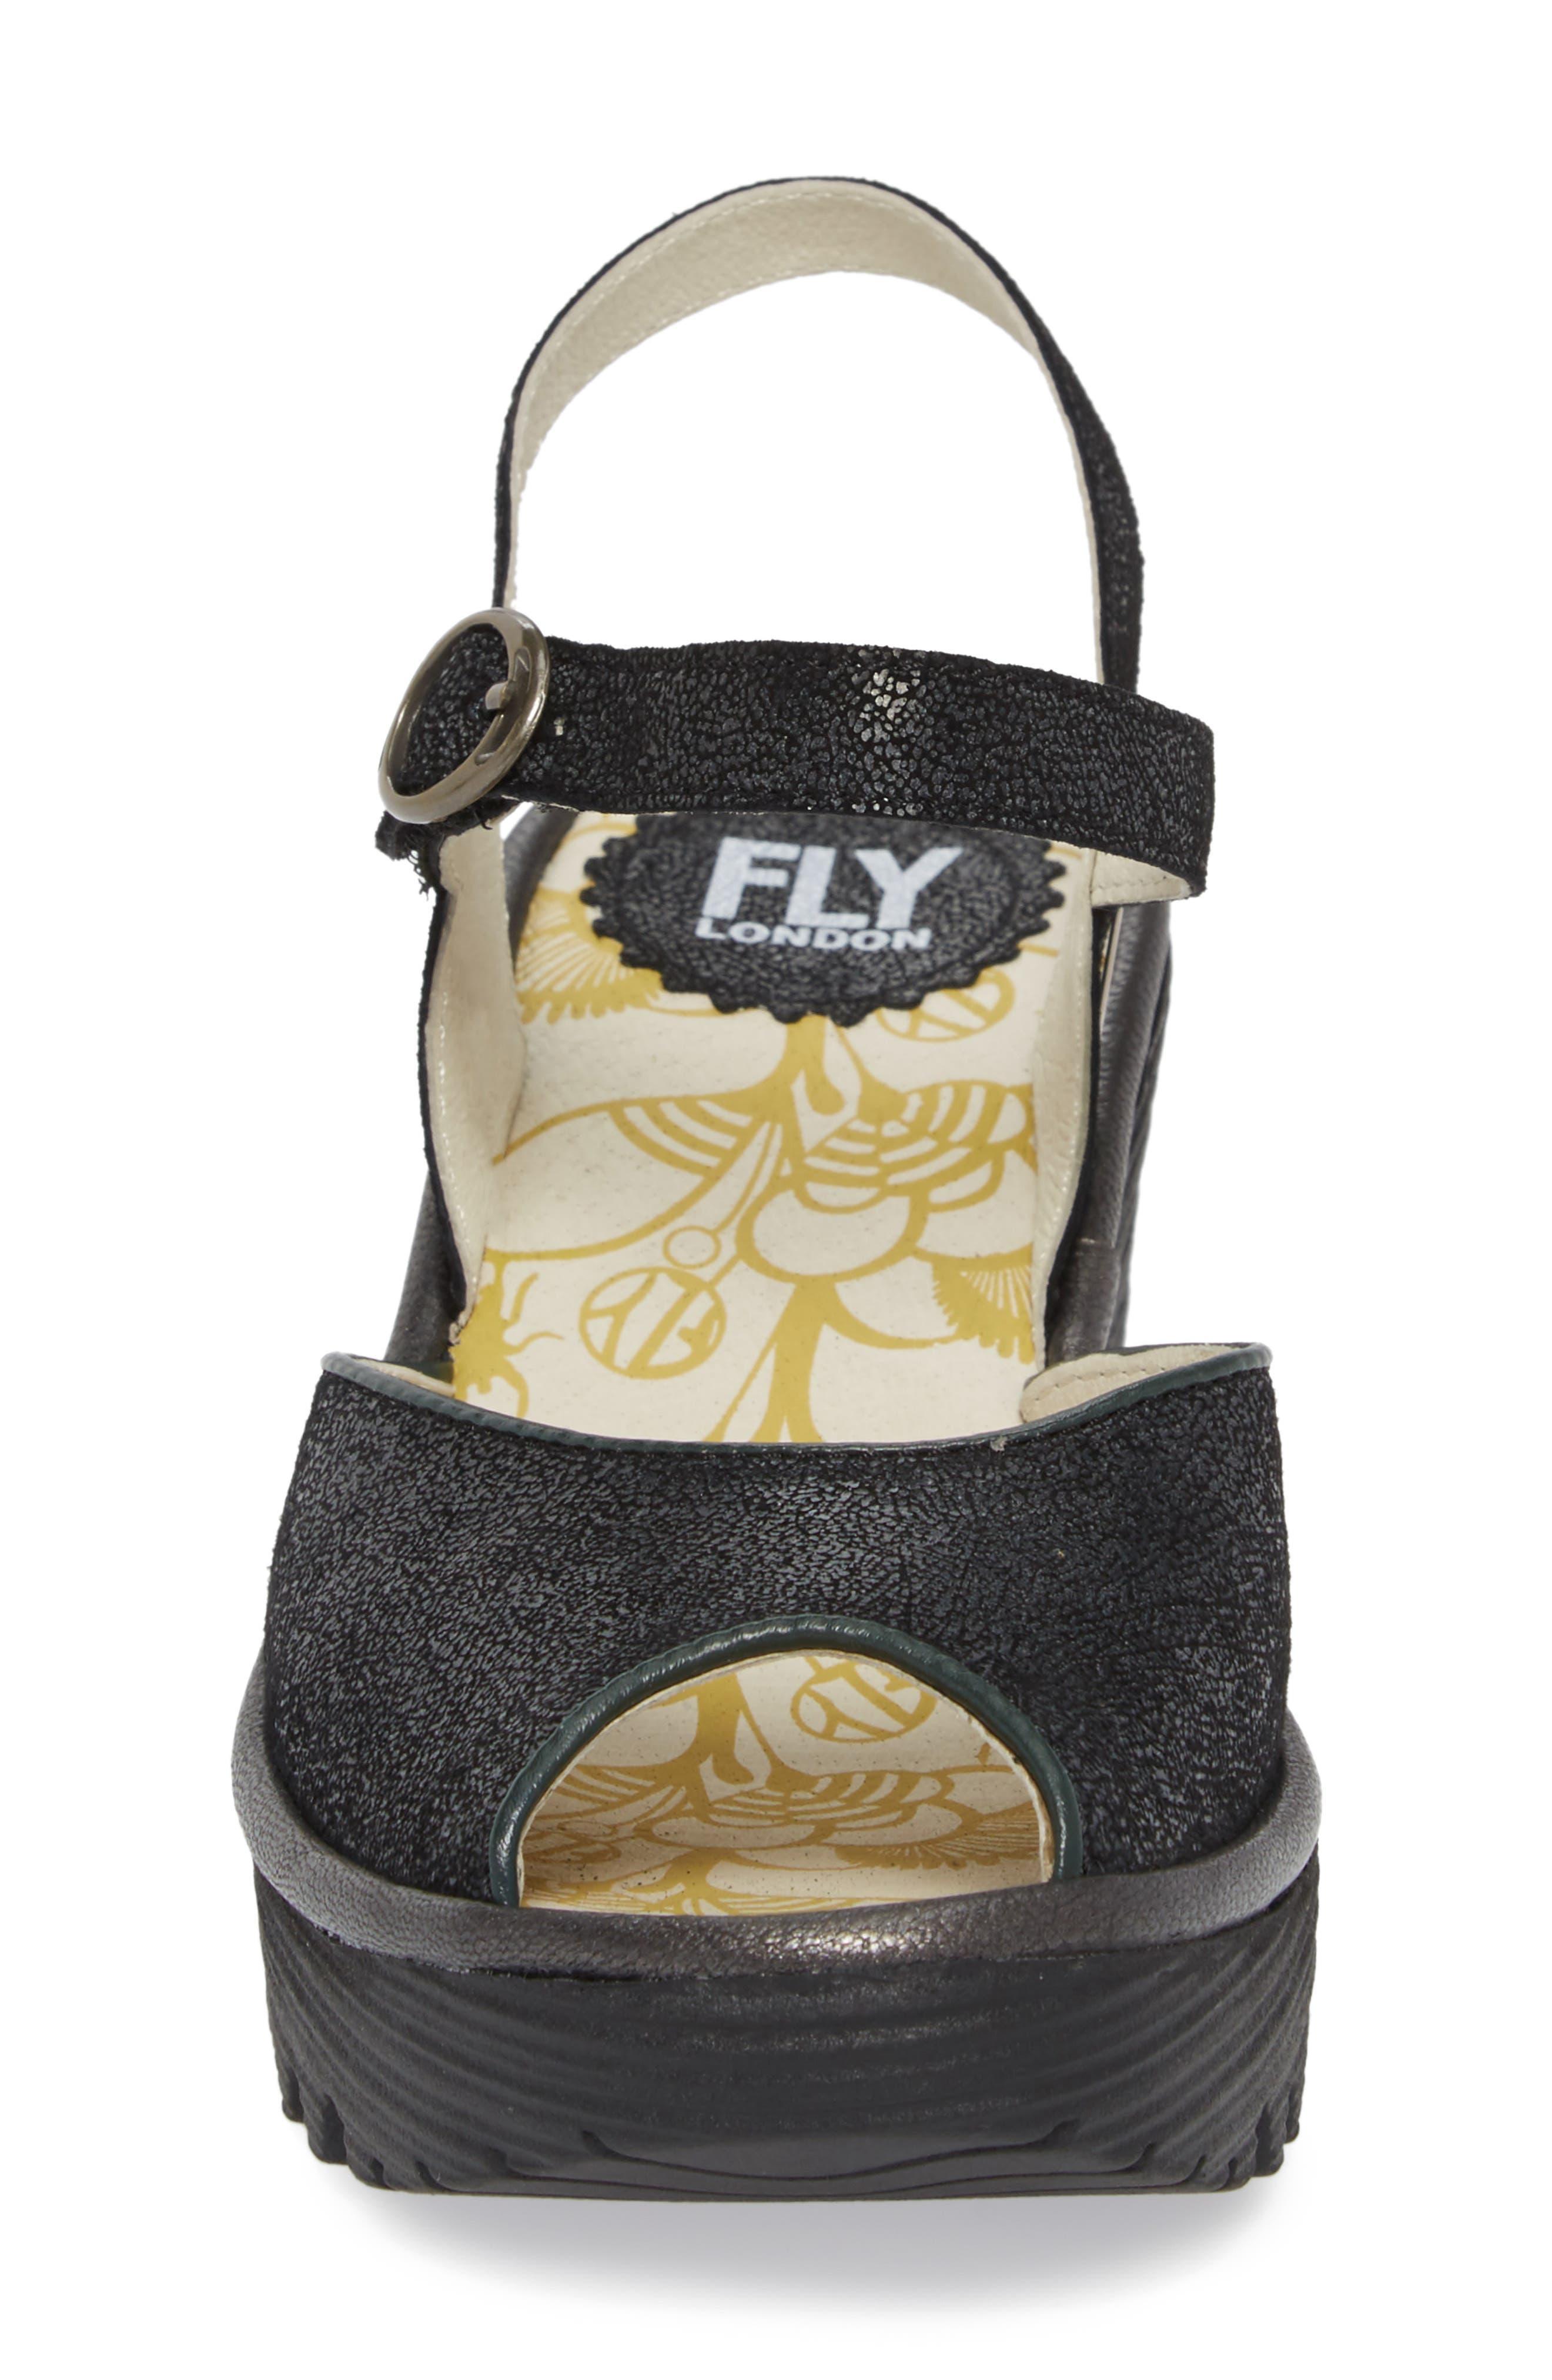 Yora Wedge Sandal,                             Alternate thumbnail 4, color,                             Black/ Graphite Leather